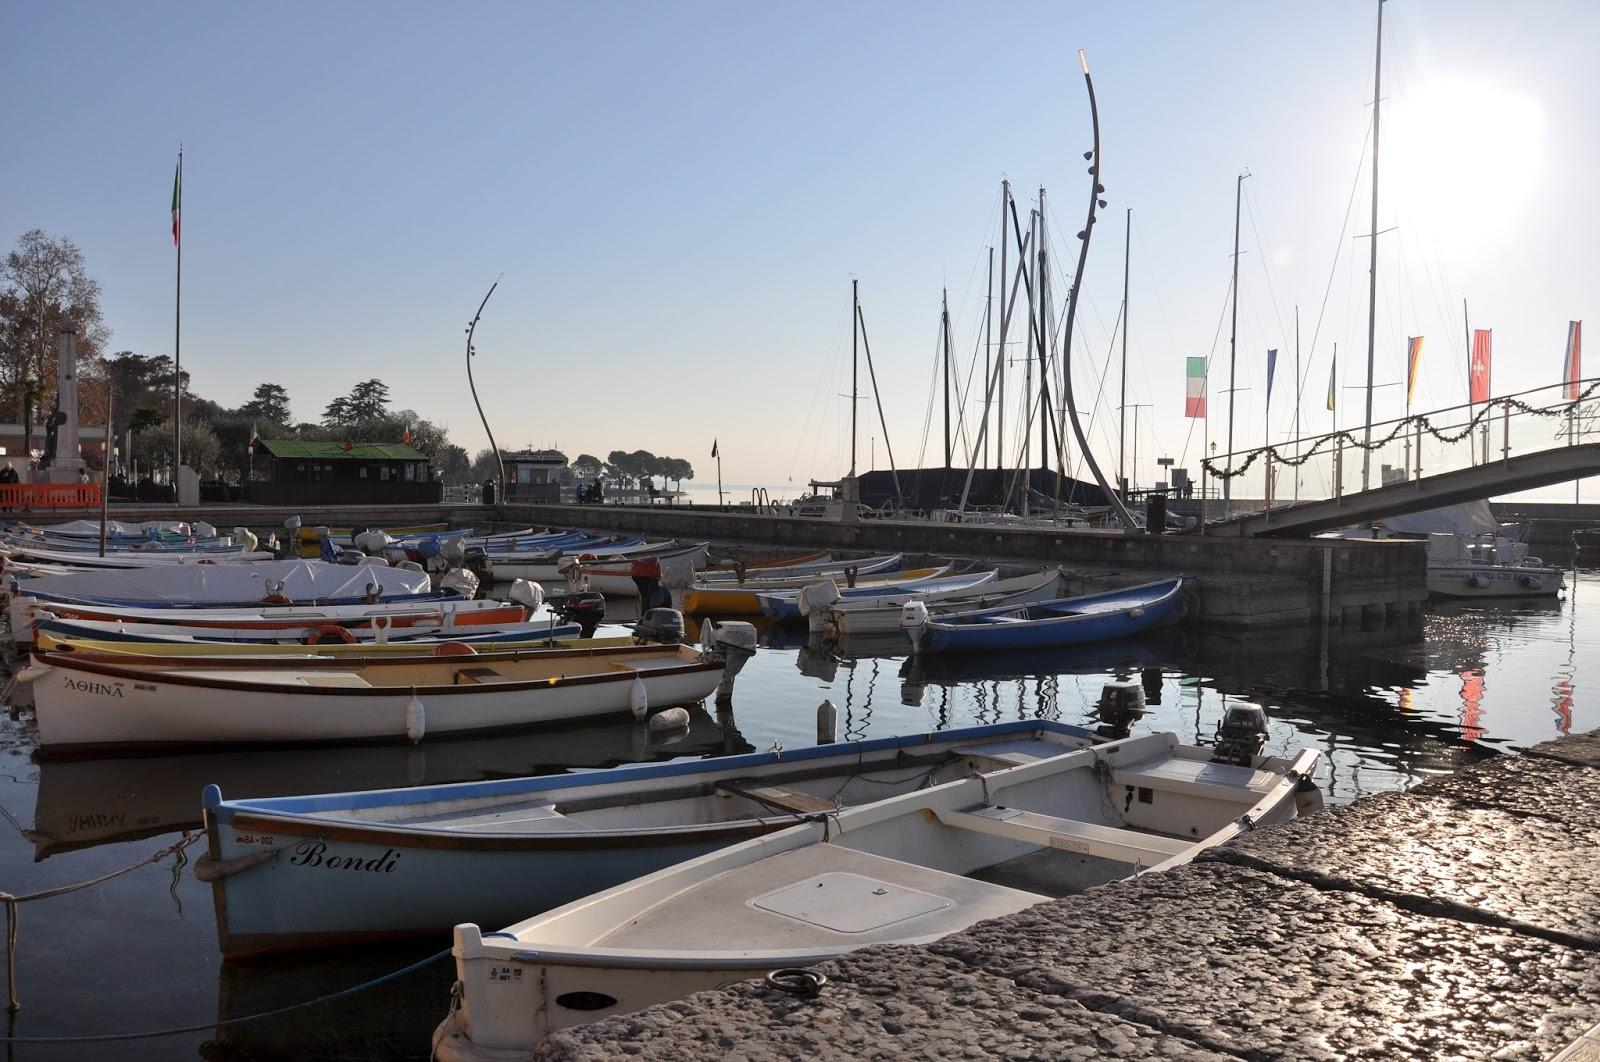 Boats, Bardolino, Lake Garda, Italy